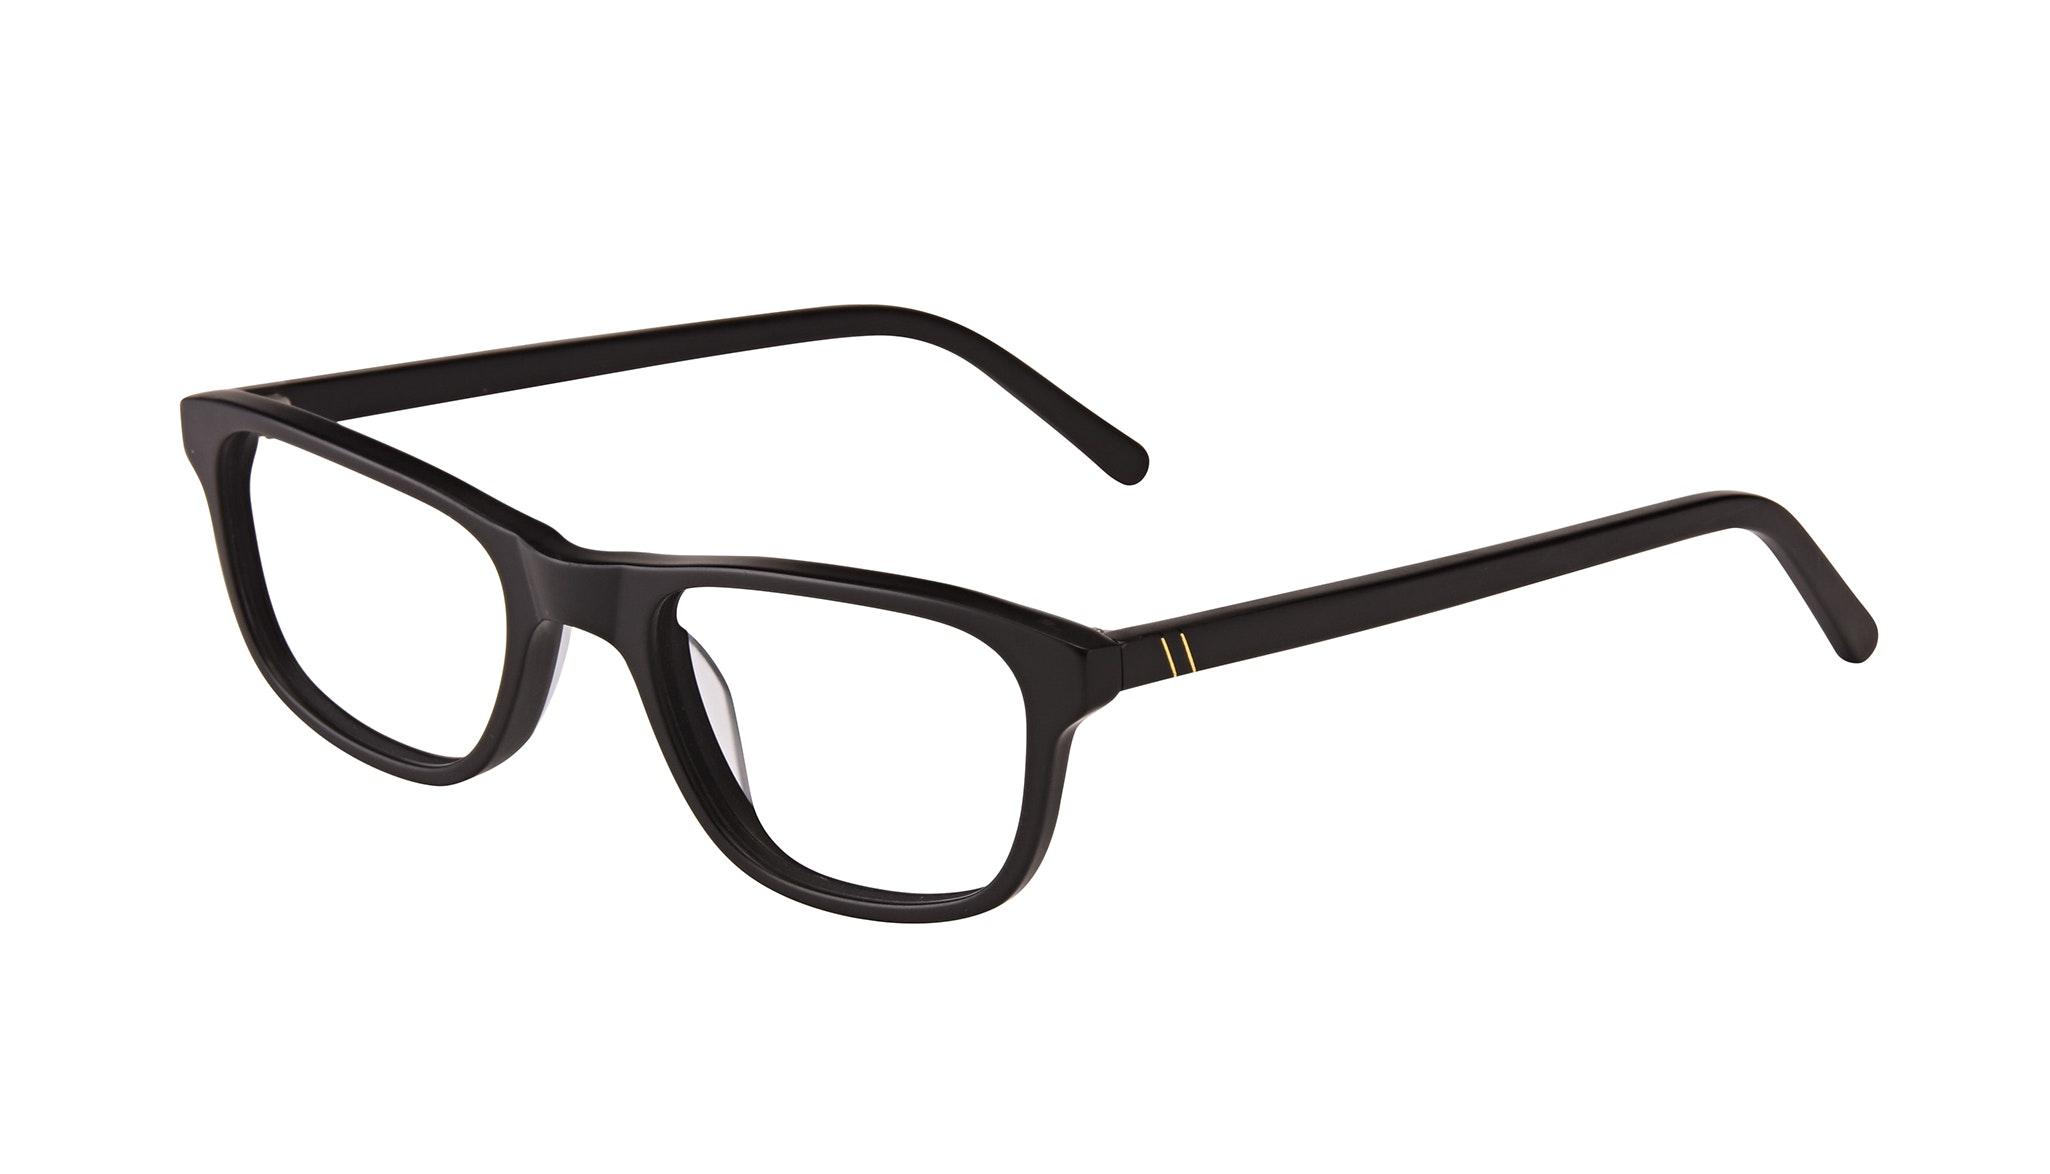 Affordable Fashion Glasses Rectangle Eyeglasses Men Neat Matte Black Tilt